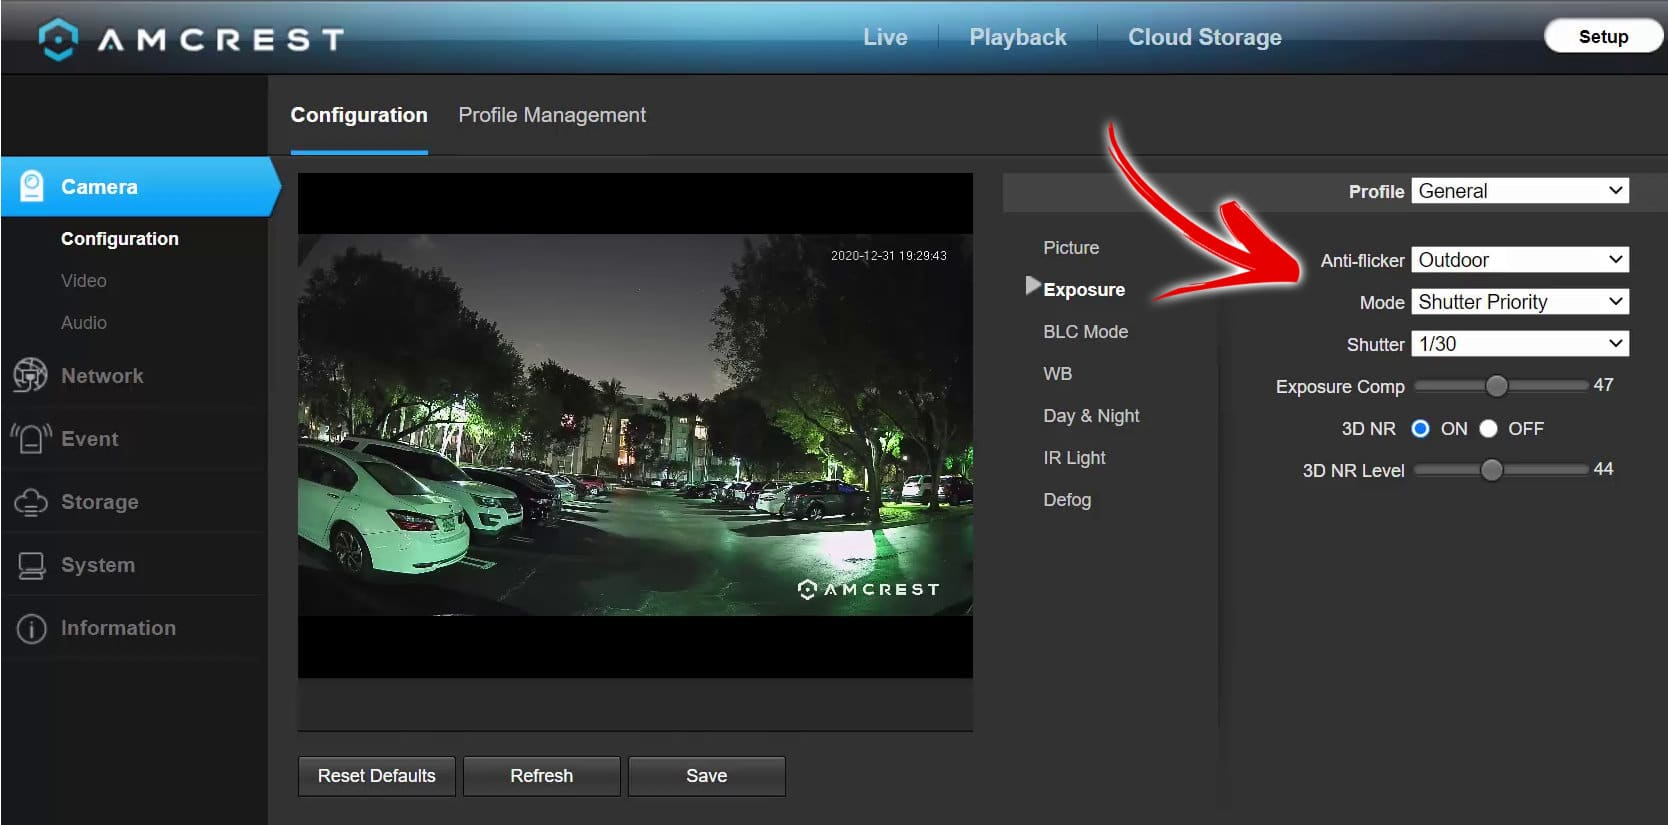 Amcrest Nigh-Color Camera exposure menu